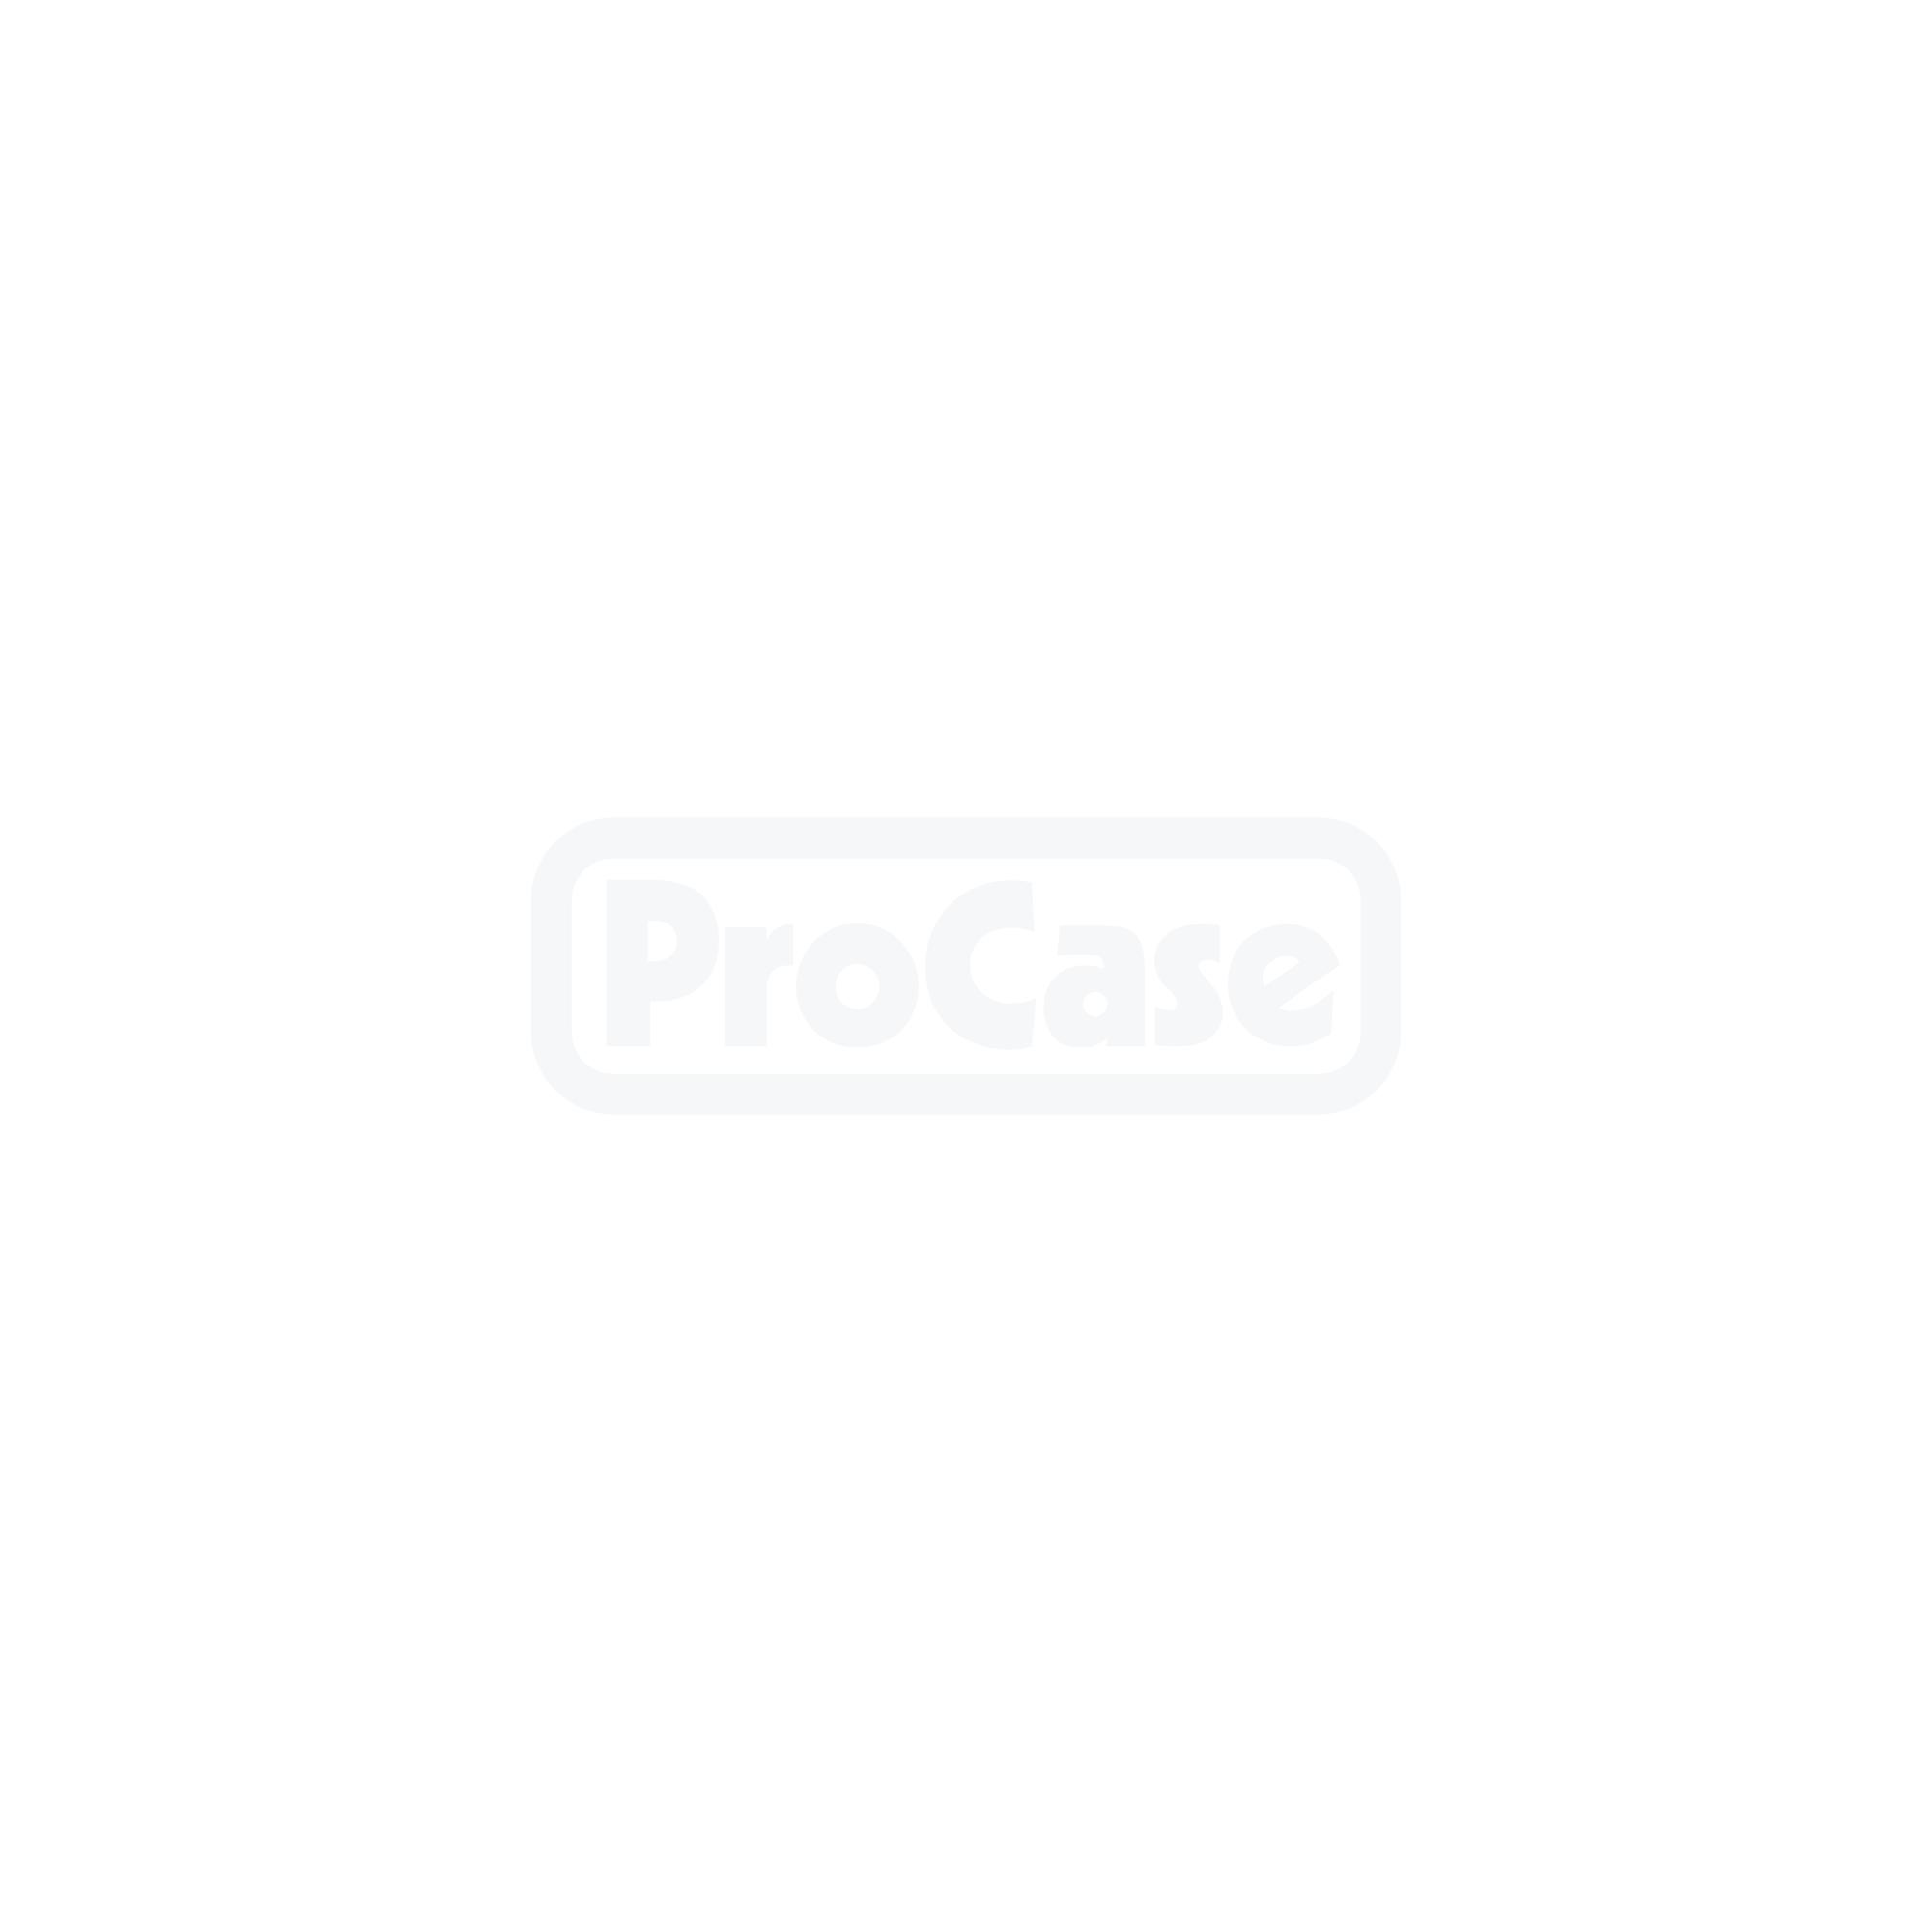 Flightcase für 6 Mikrofonstative + 6 Boxenstative 4